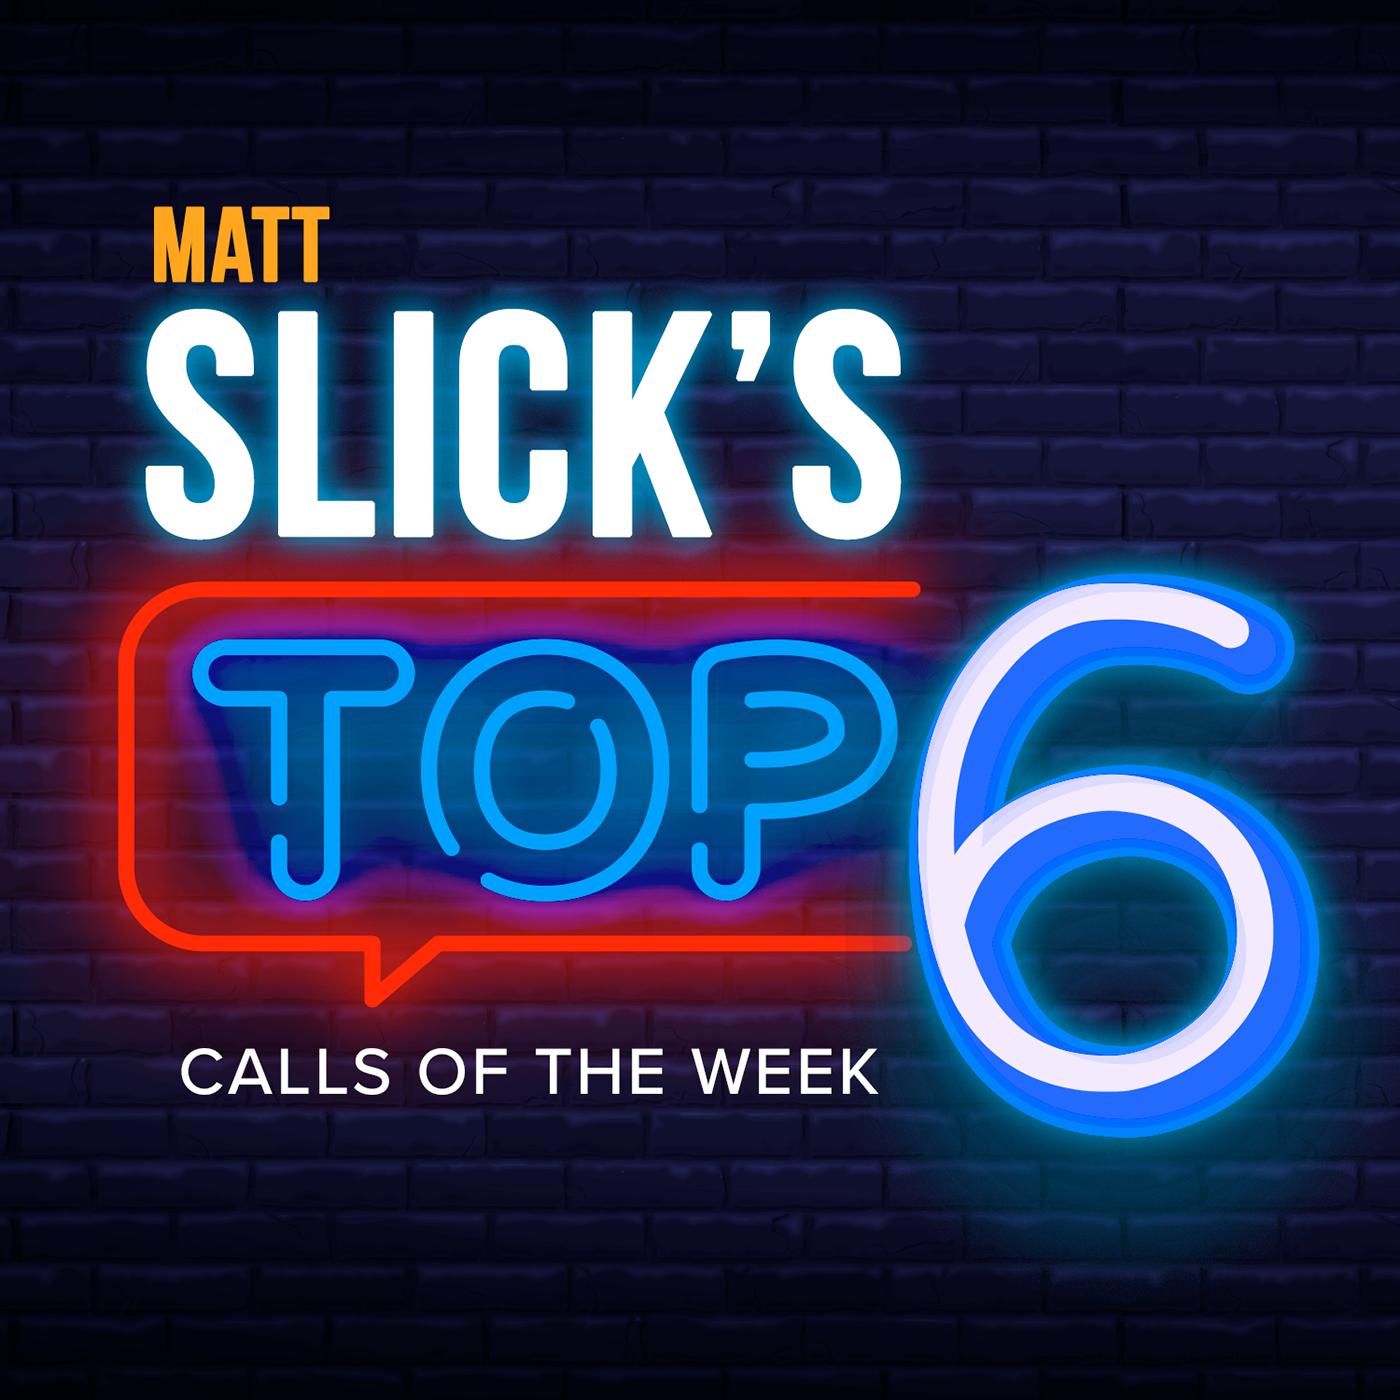 Matt's Slick's TOP 6 show art